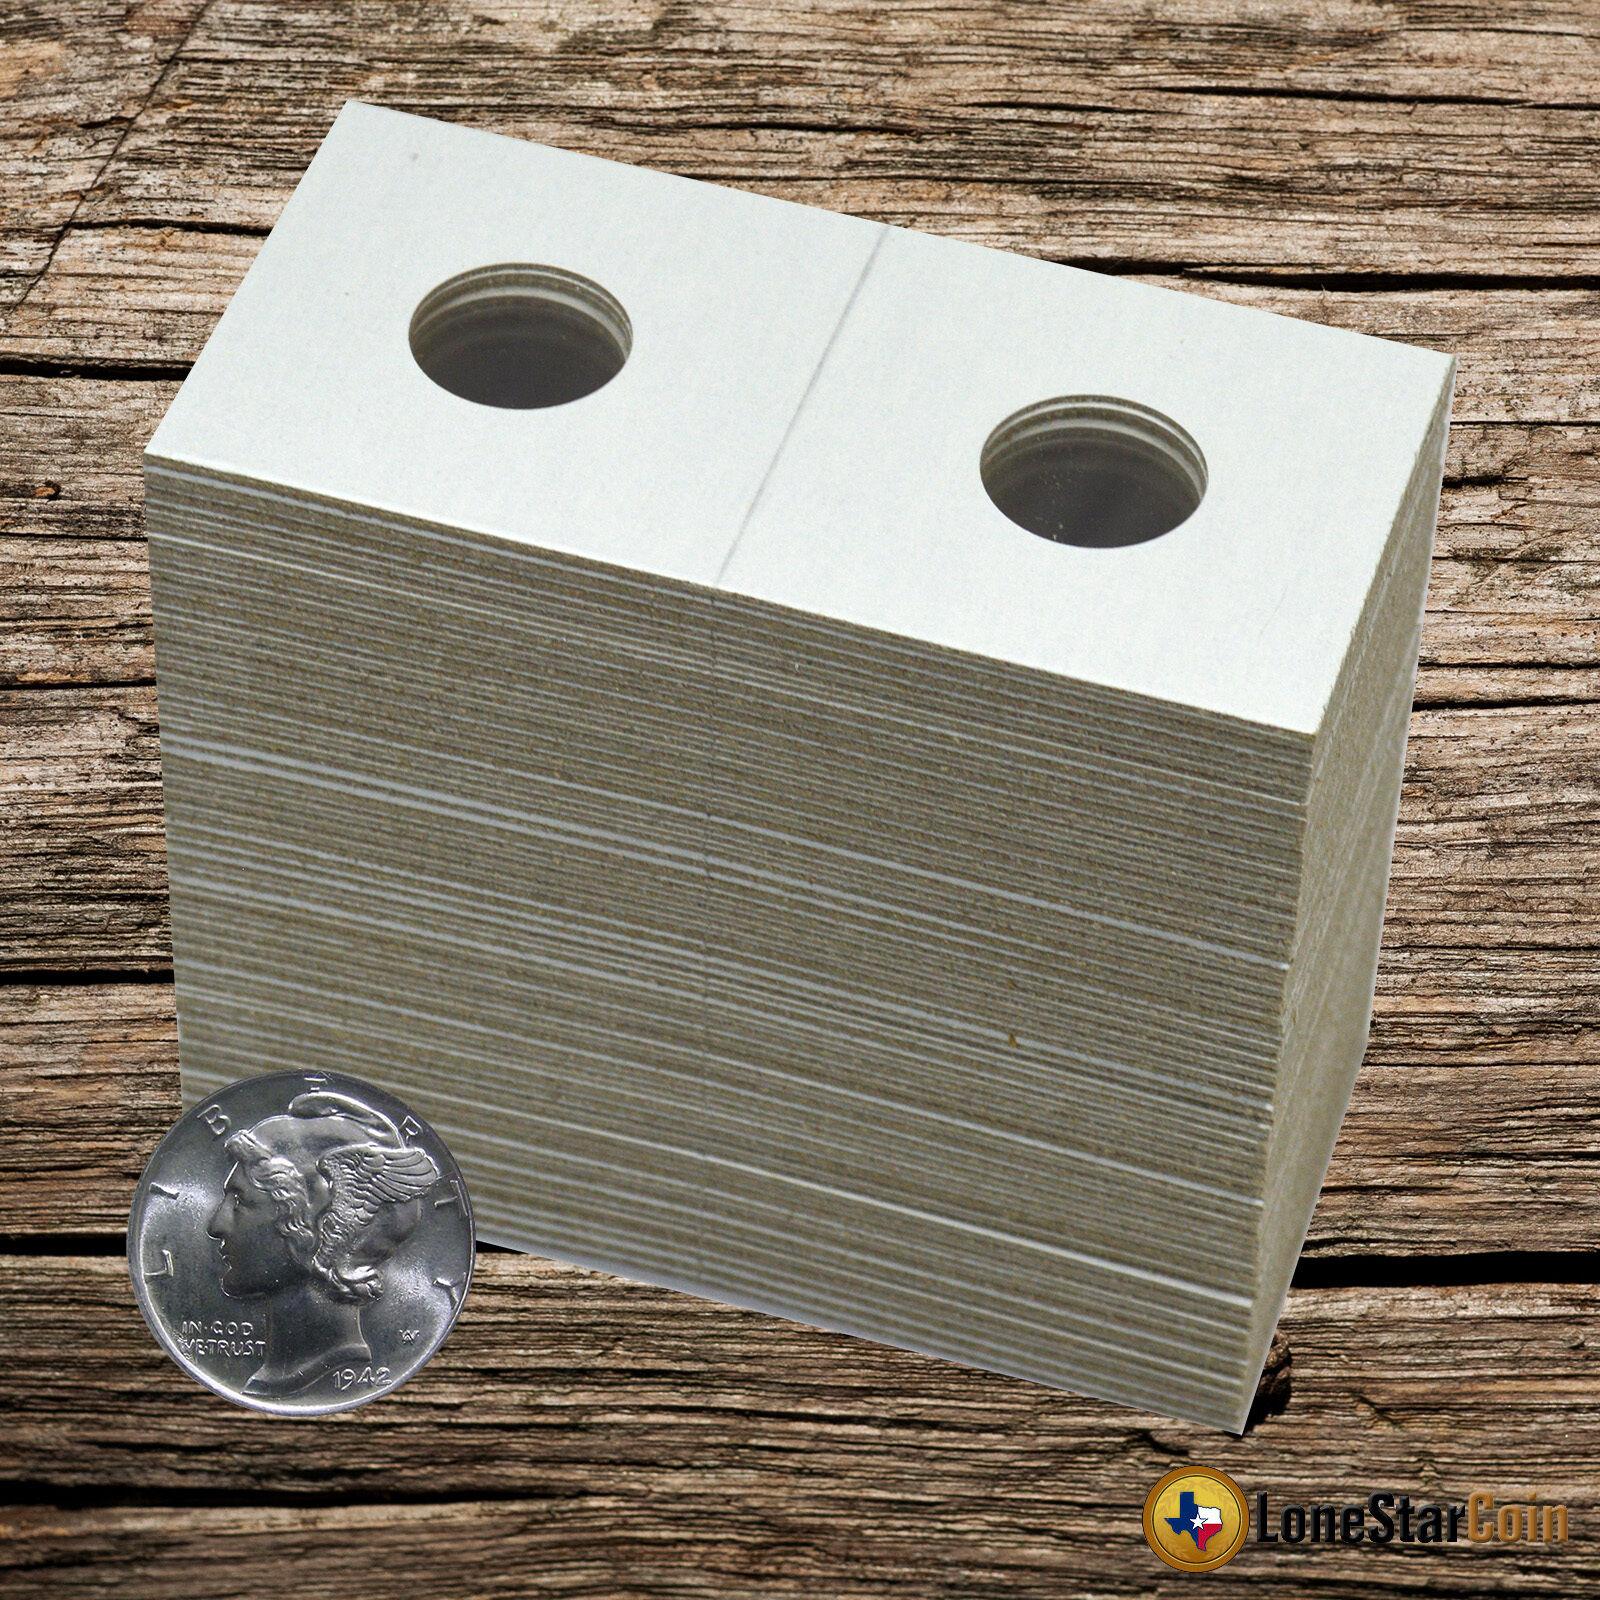 100 2x2 ROOSEVELT Dime Mylar Cardboard Coin Holder Flip Display Flips Guardhouse